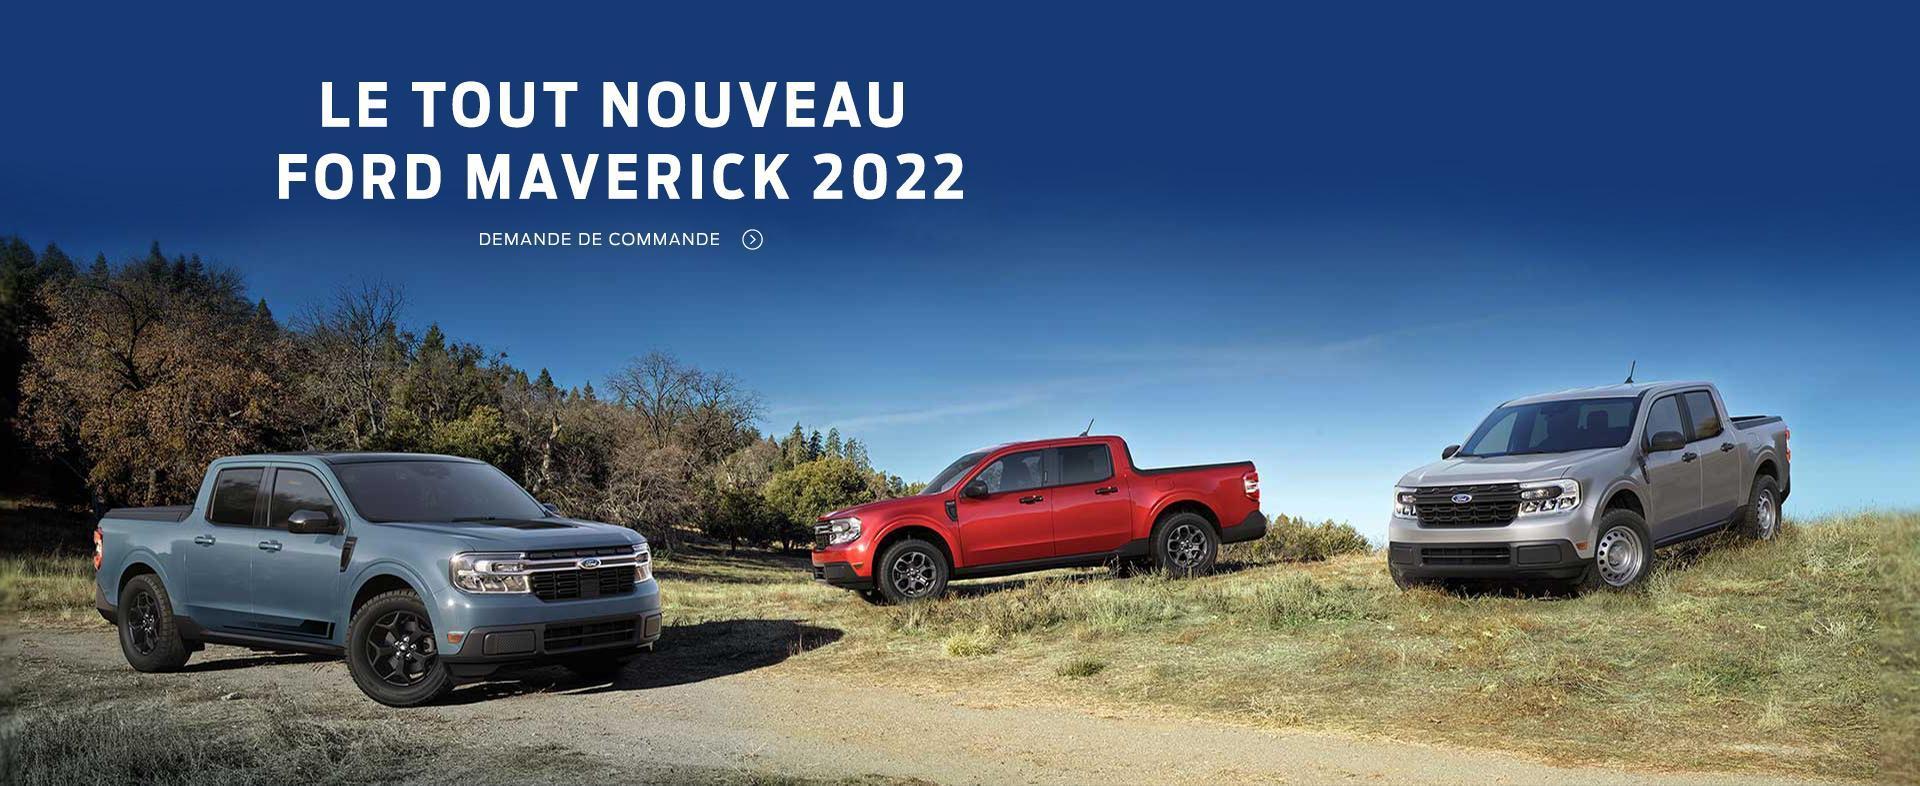 Ford Maverick 2022 | Ford du Canada